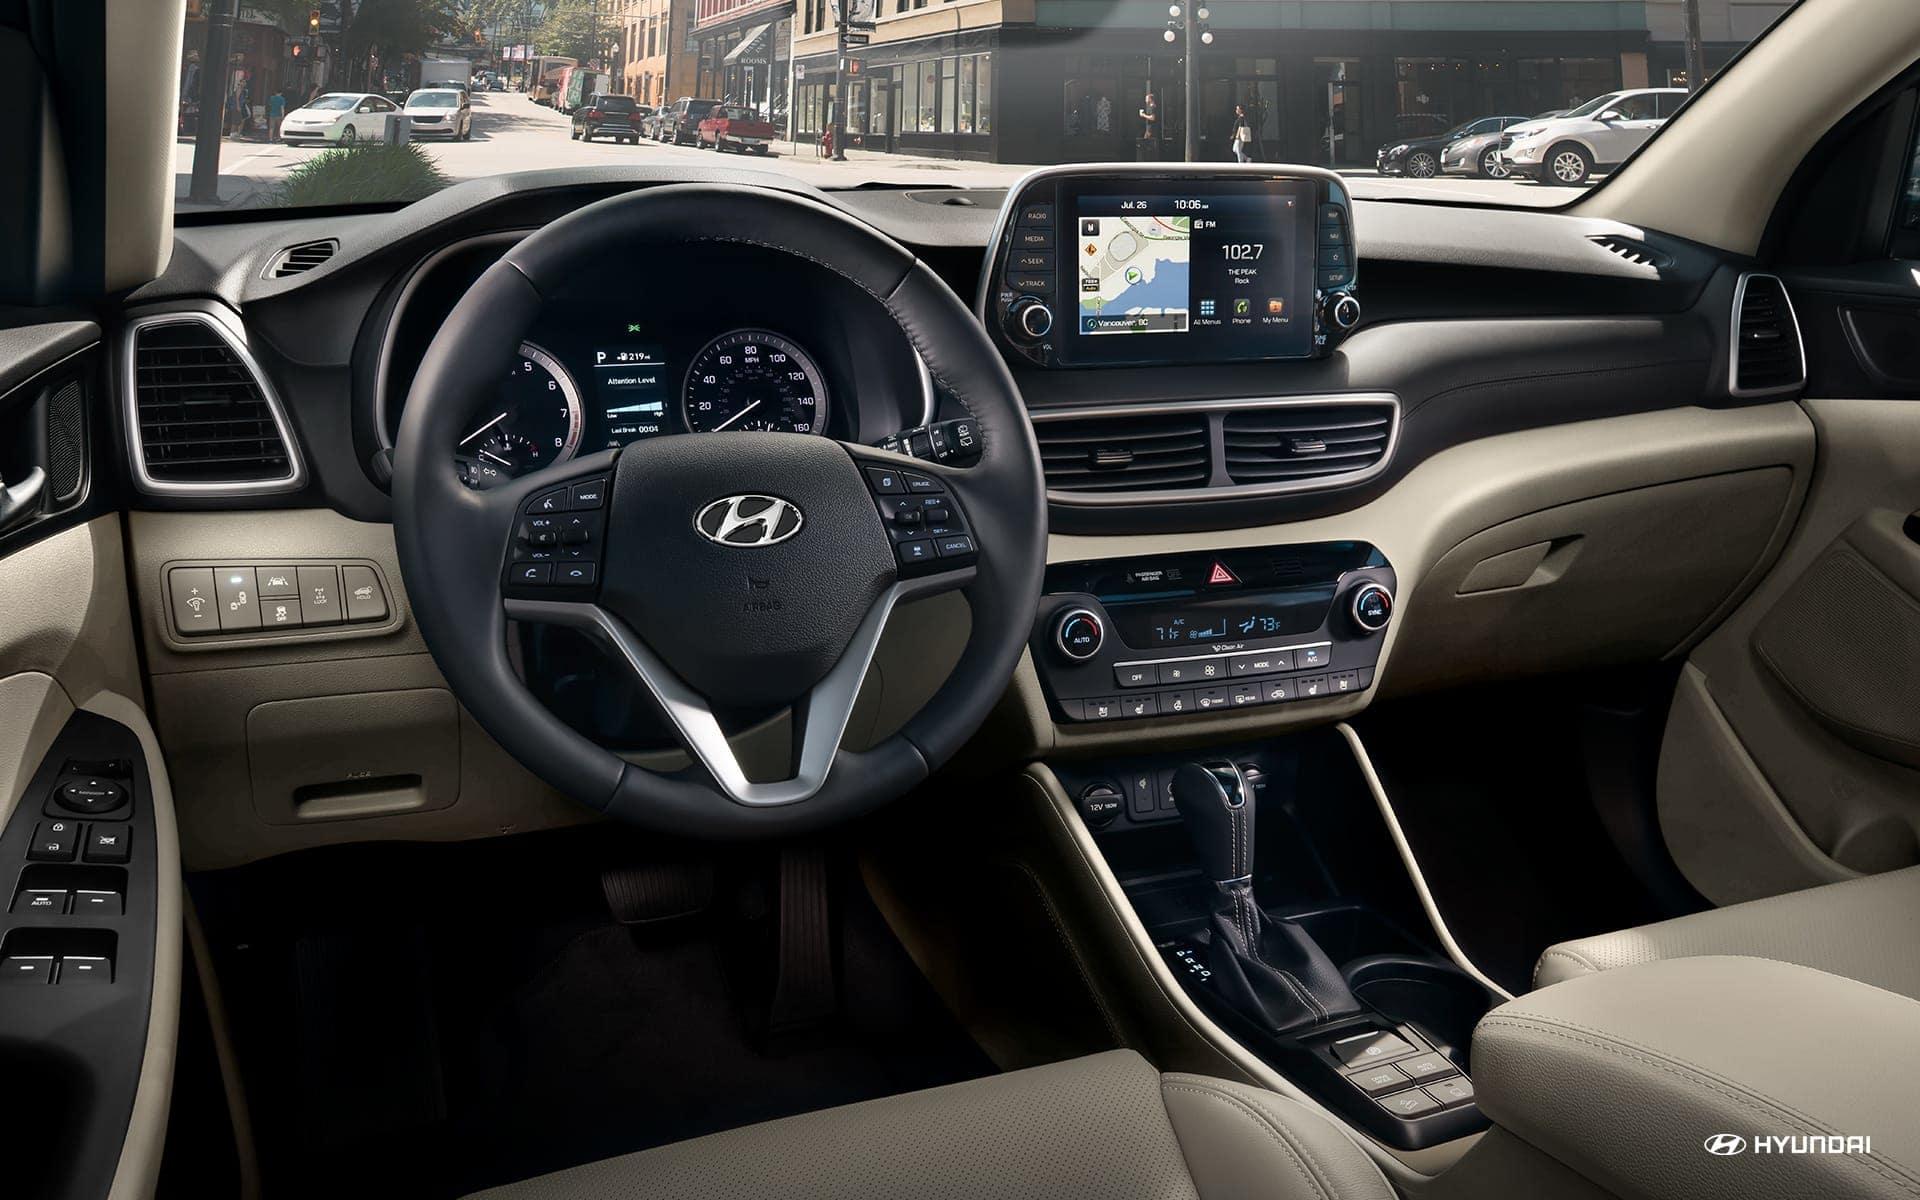 2019 Hyundai Tucson Center Console